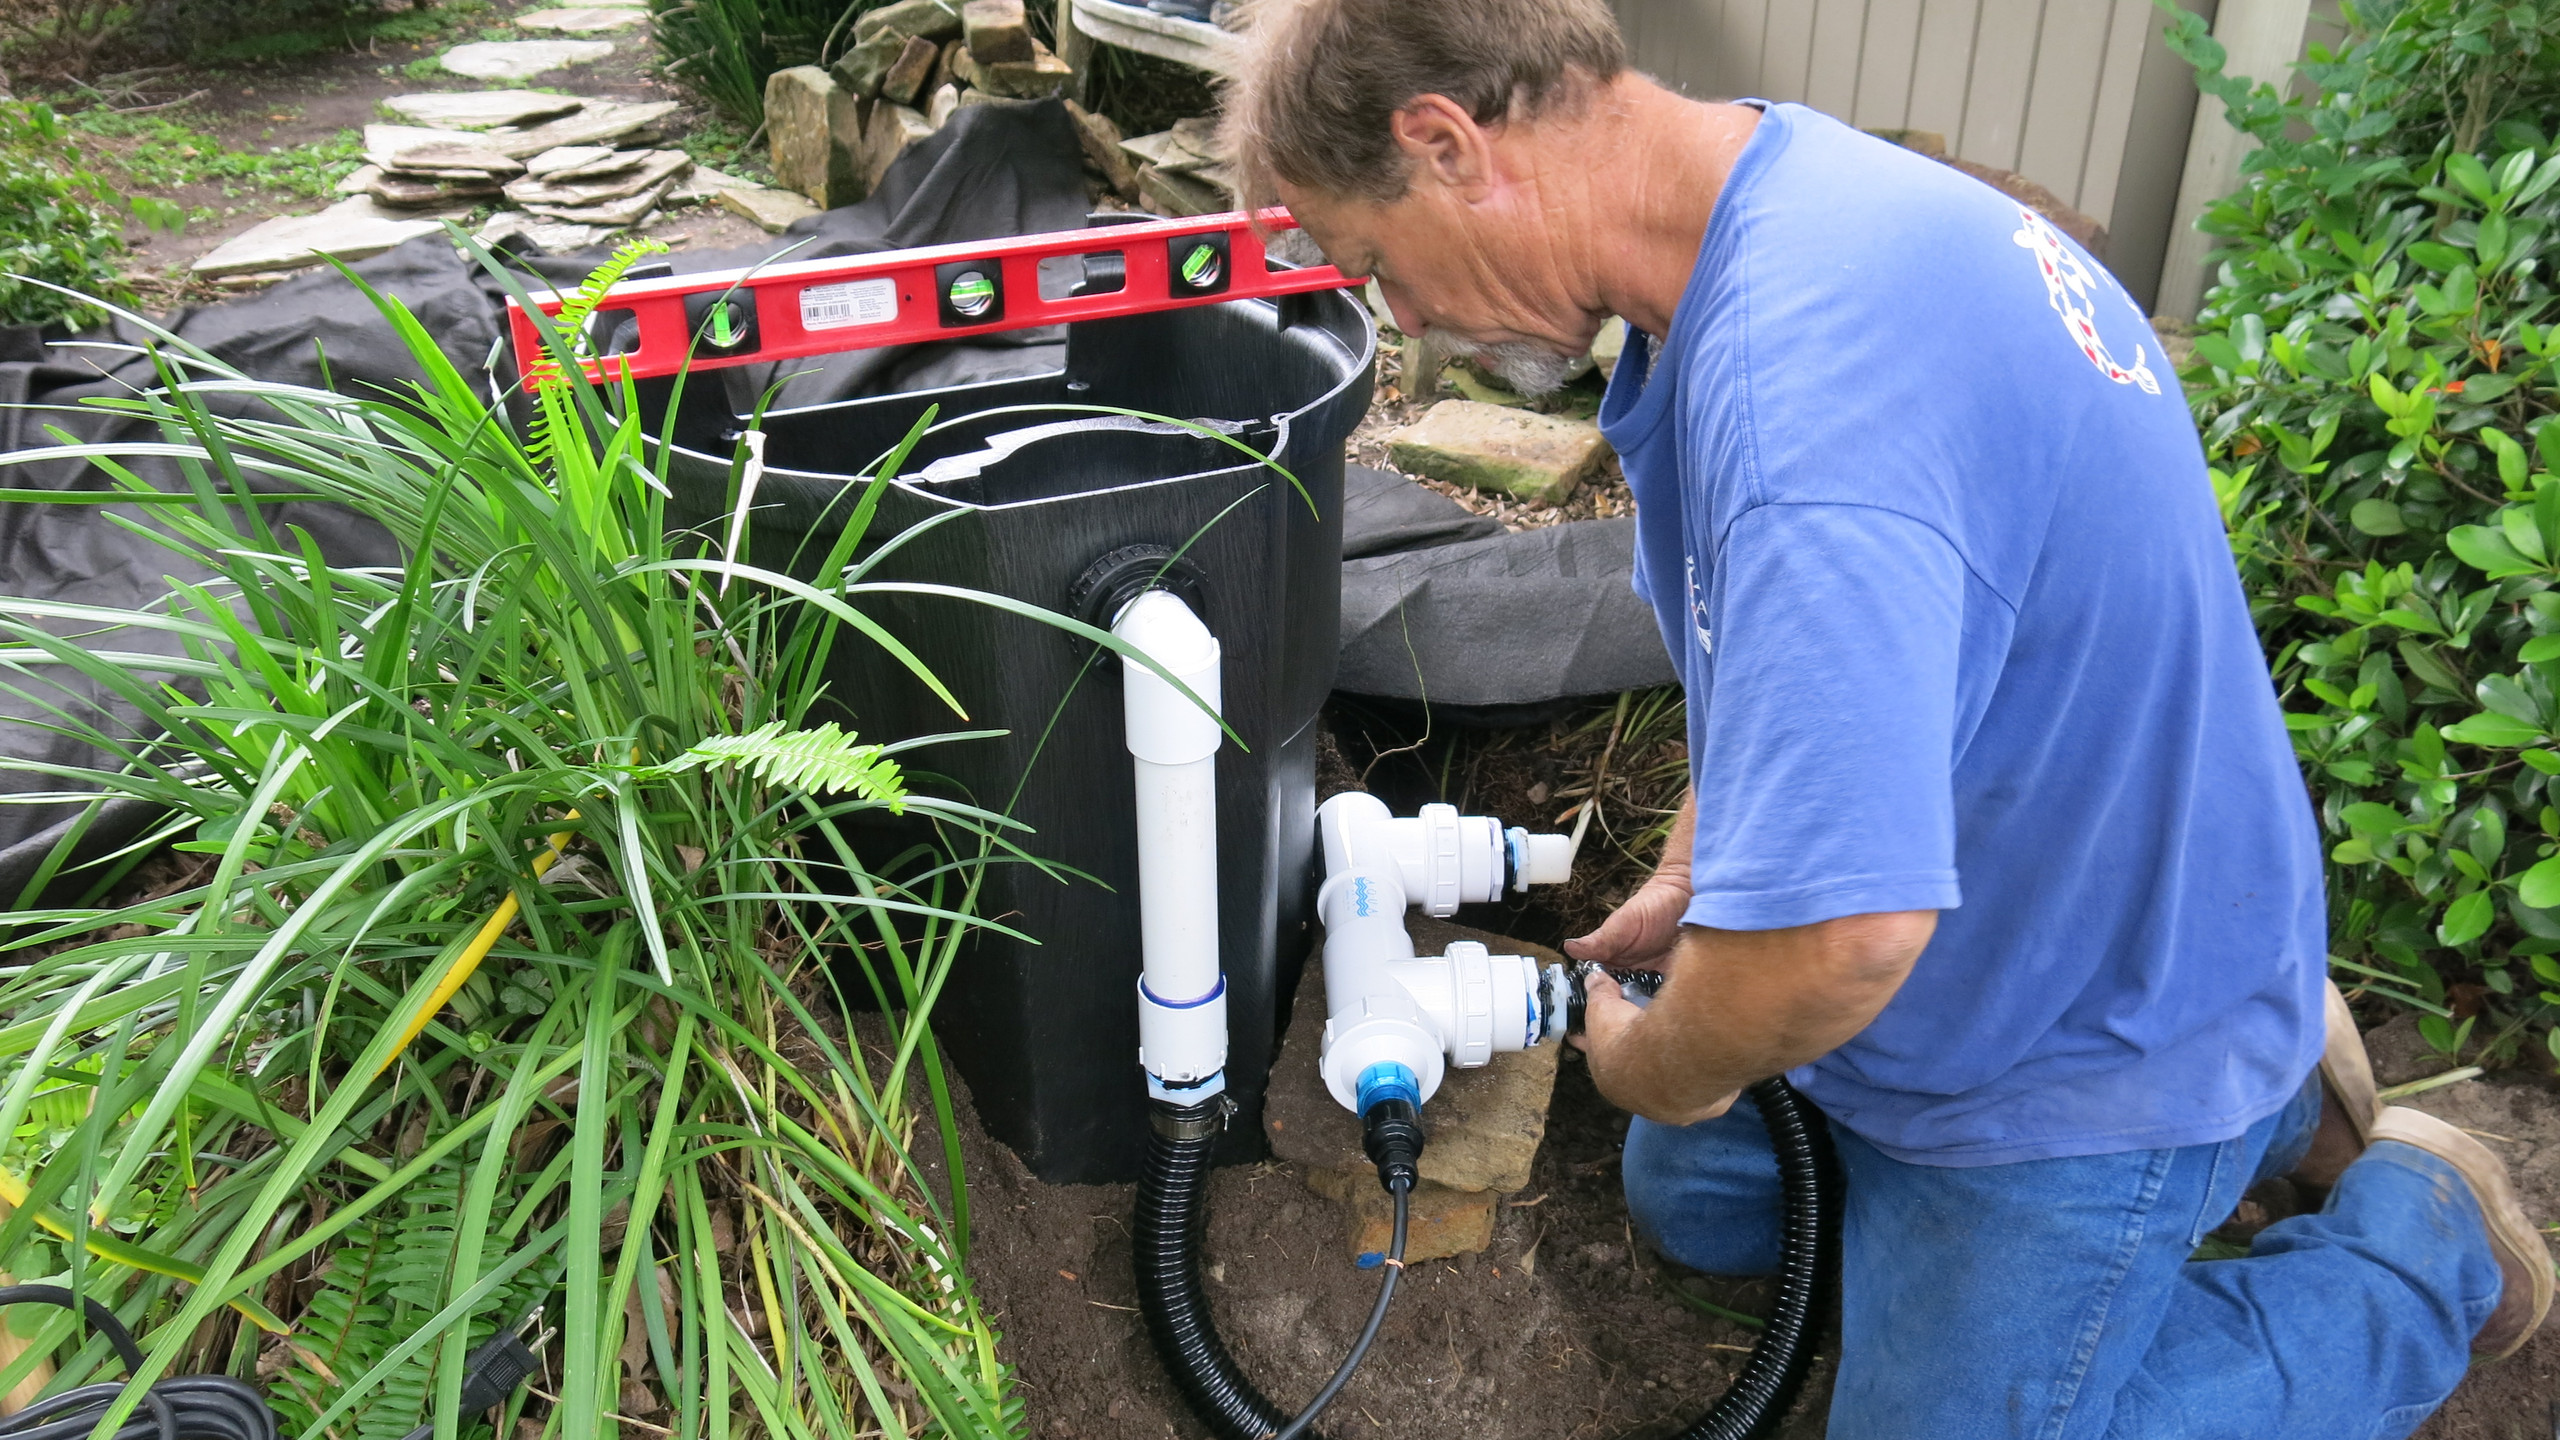 13-Plumb Aqua UV Clarification System